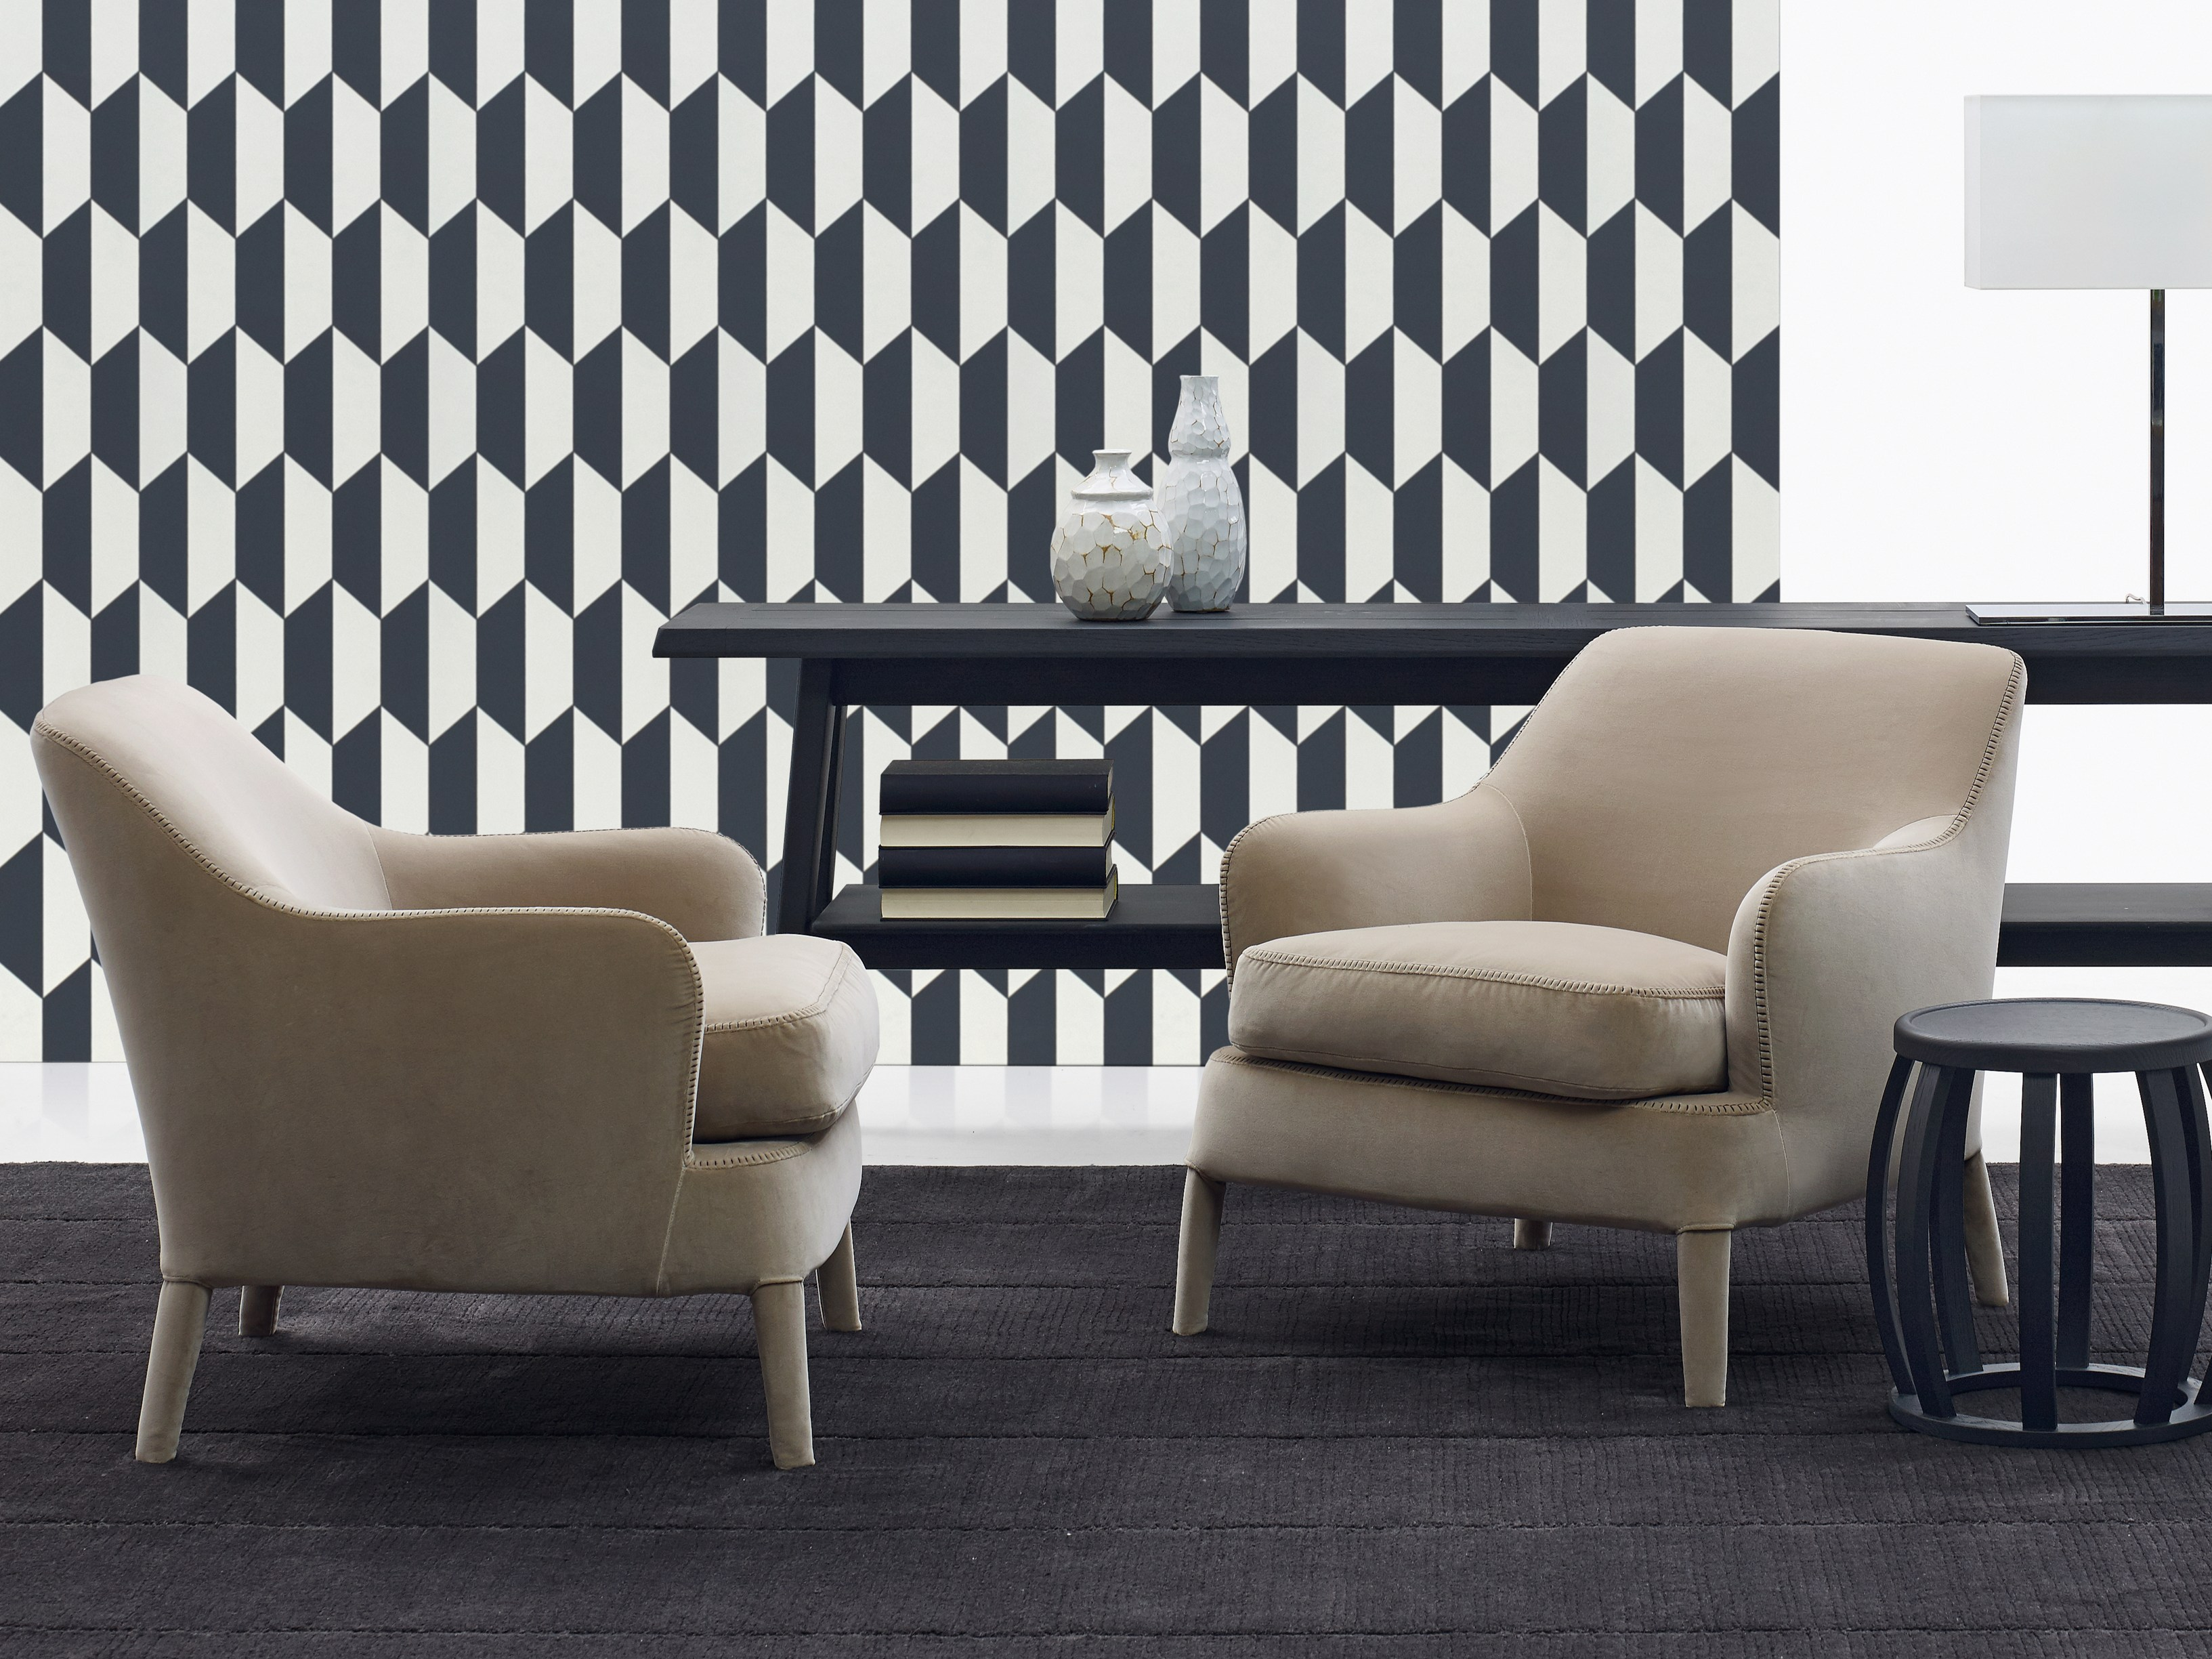 Febo armchair by maxalto a brand of b b italia spa design for B b maxalto